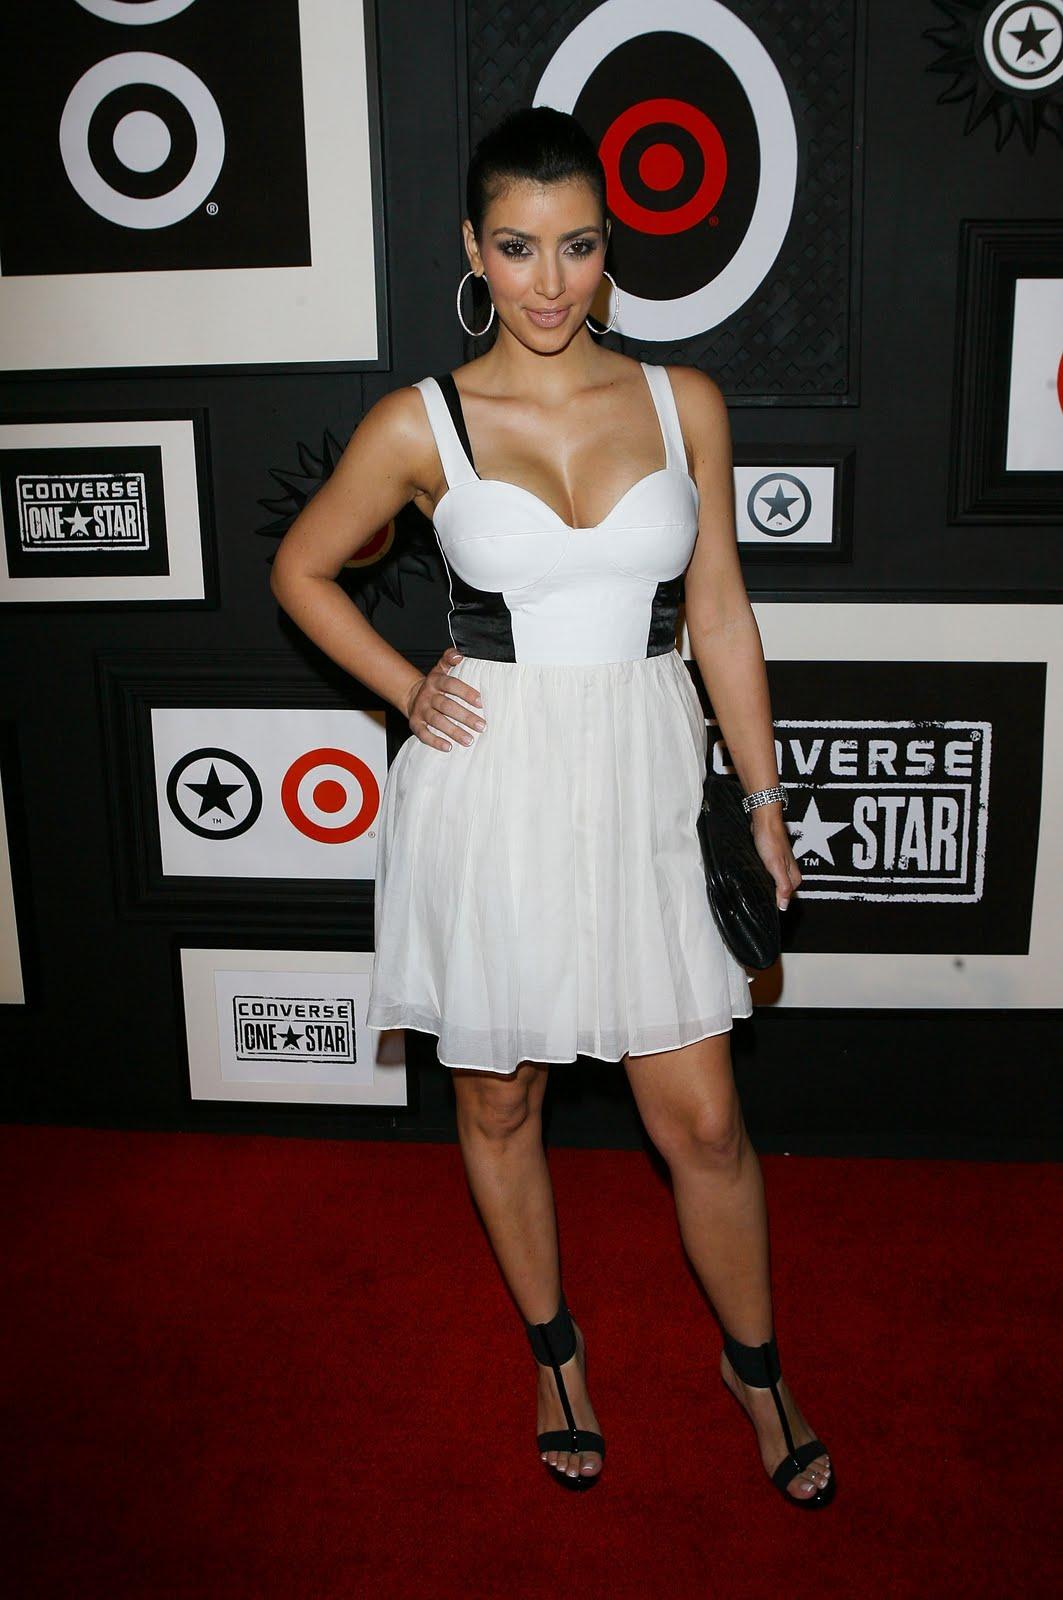 http://2.bp.blogspot.com/__dSMljhXGag/TBPQG6ClPlI/AAAAAAAAC4c/JwGQocGuYyA/s1600/05570_Kim_Kardashian-Target_0_Converse_One_Star_Movie_Award_058_122_420lo.jpg